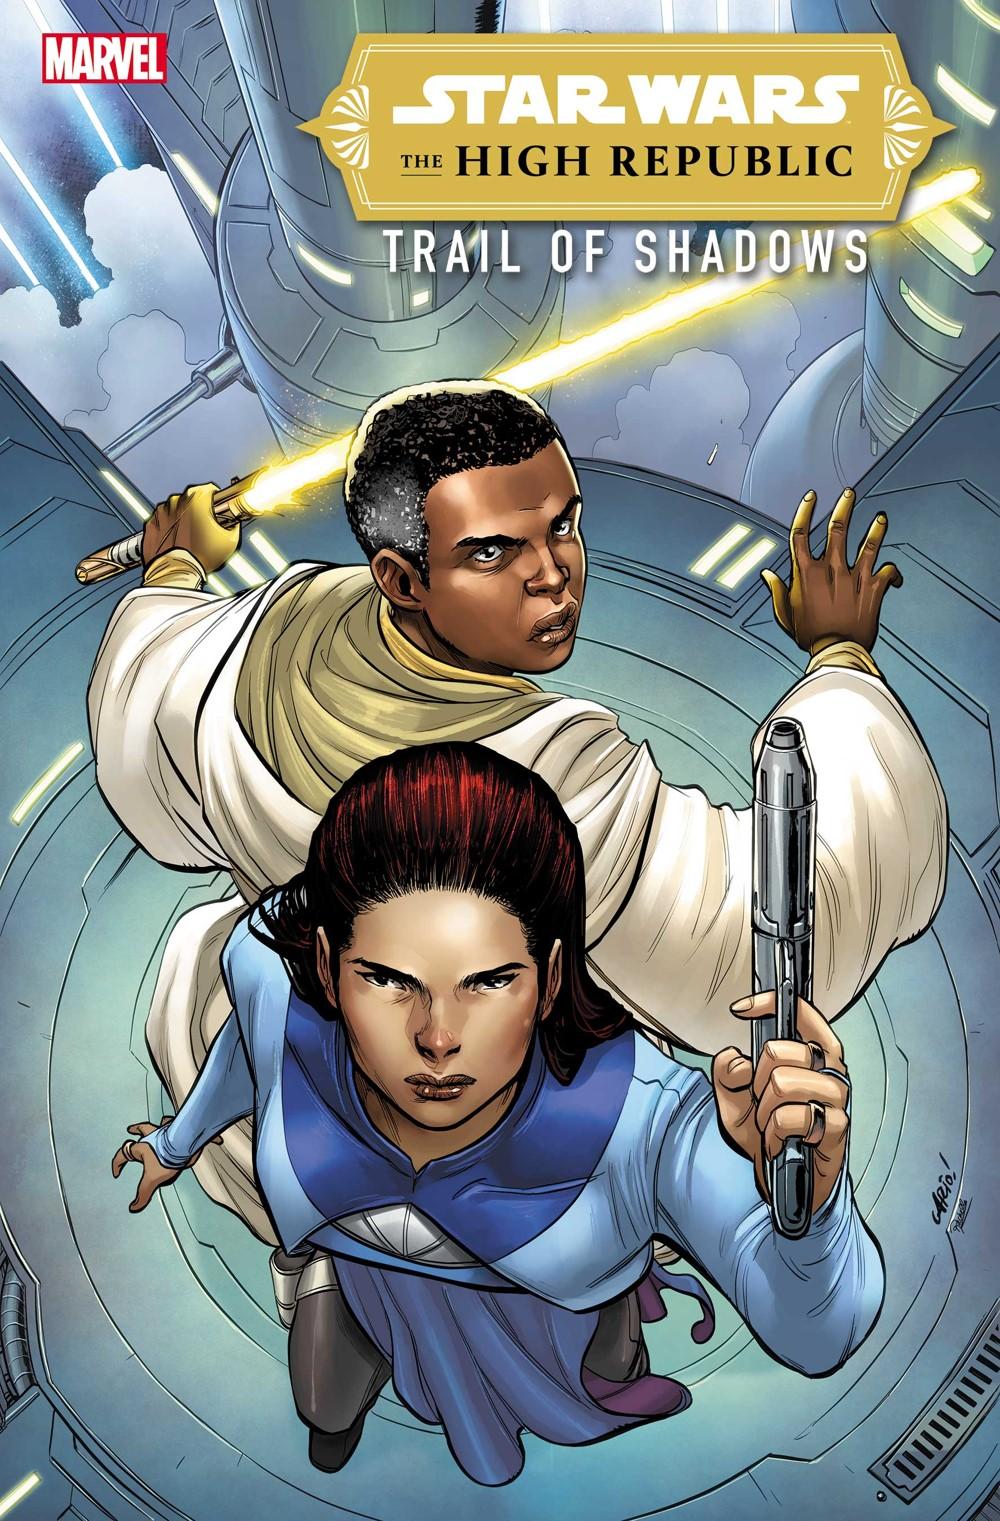 STWHIGHREPTOS2021001_ARIO Marvel Comics October 2021 Solicitations